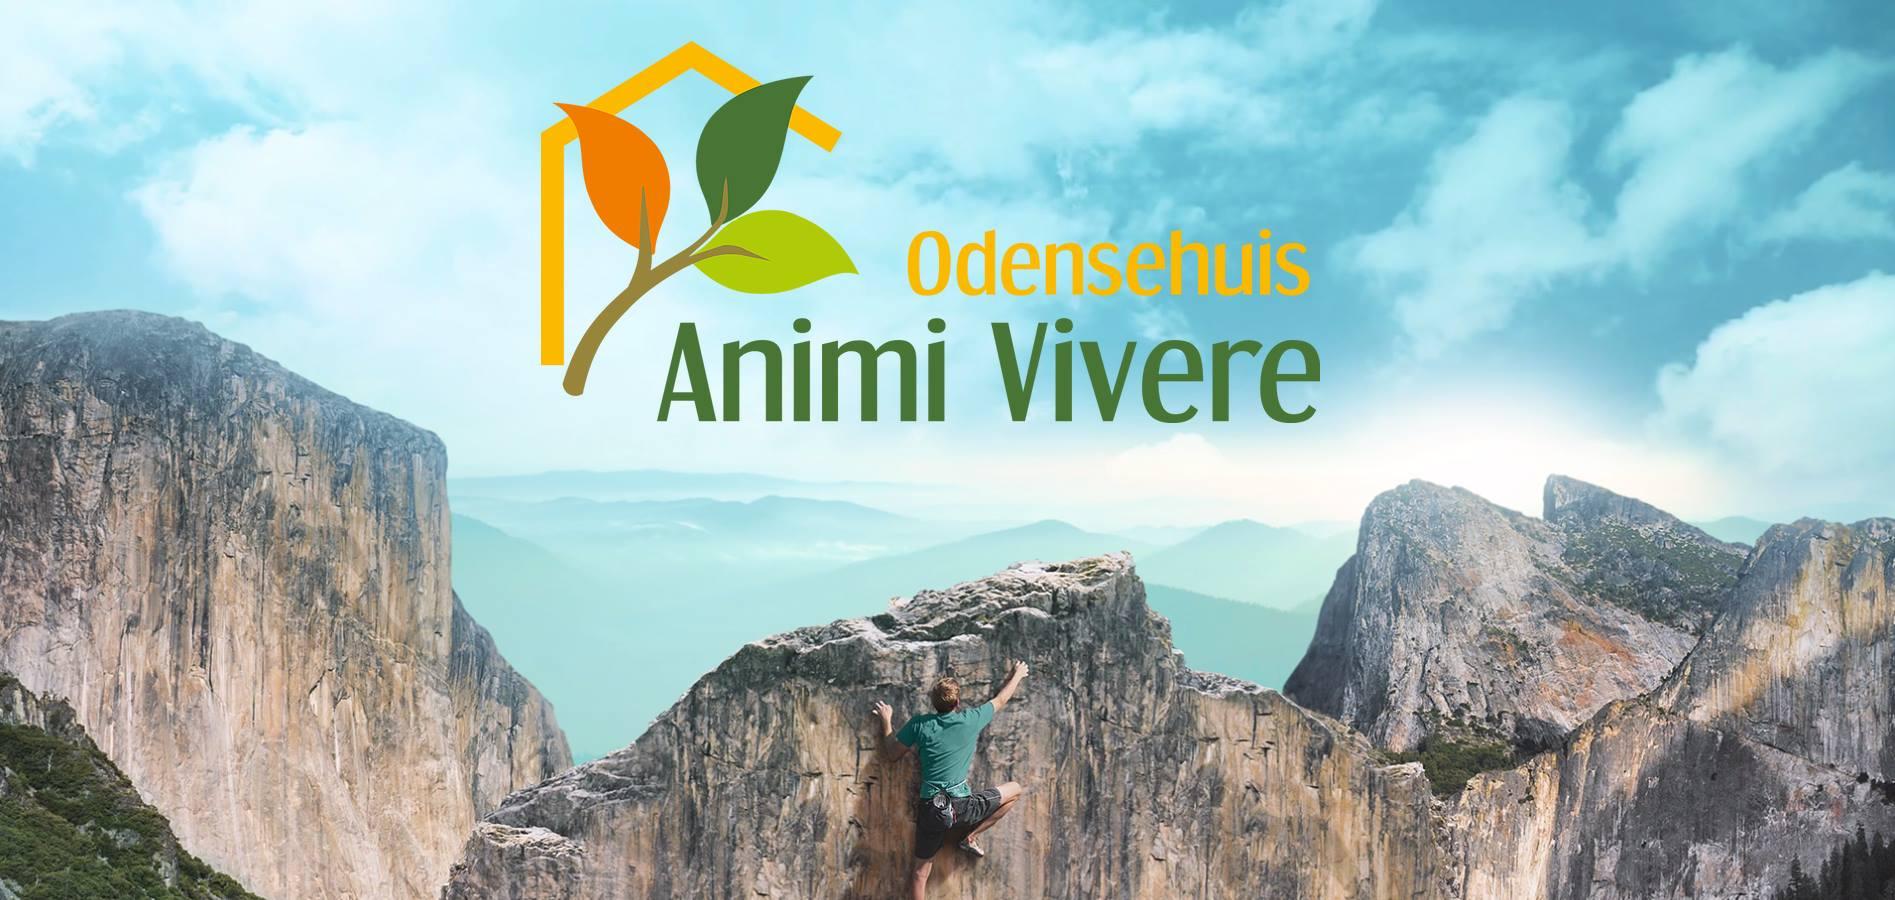 Ken jij het Odensehuis Animi Vivere in Wijchen al?